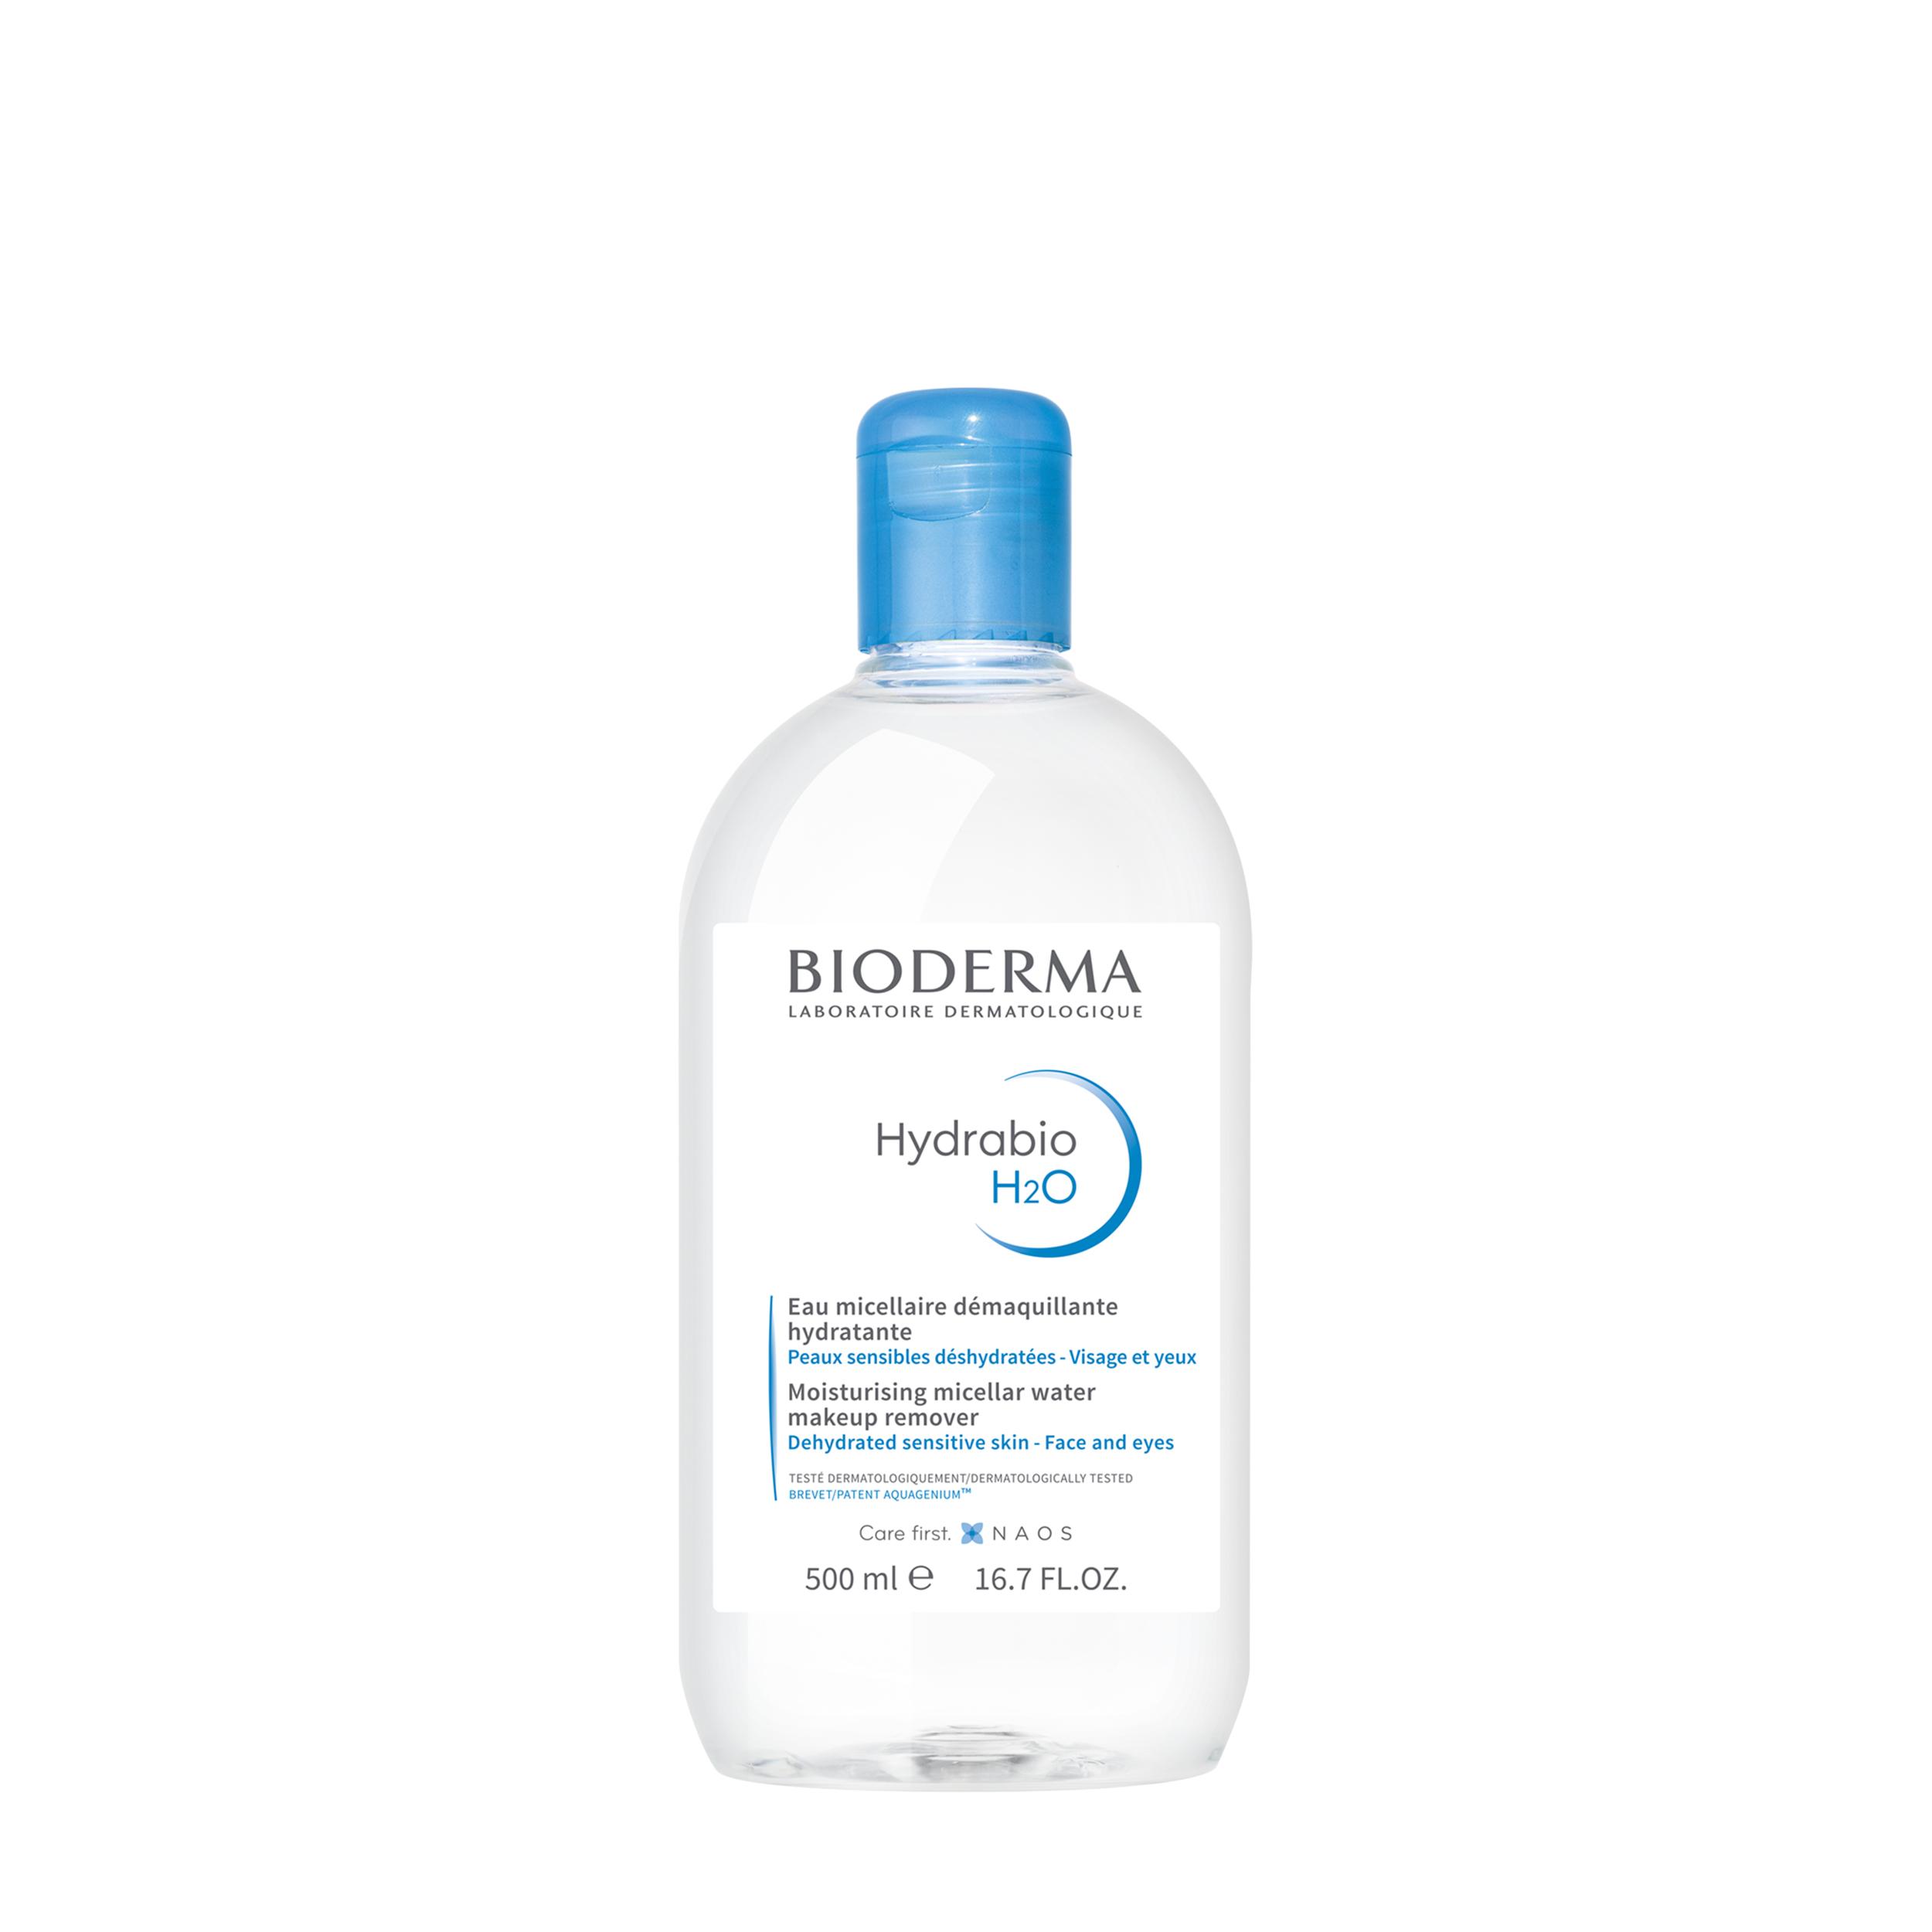 BIODERMA Гидрабио H2O Мицеллярная вода500 мл